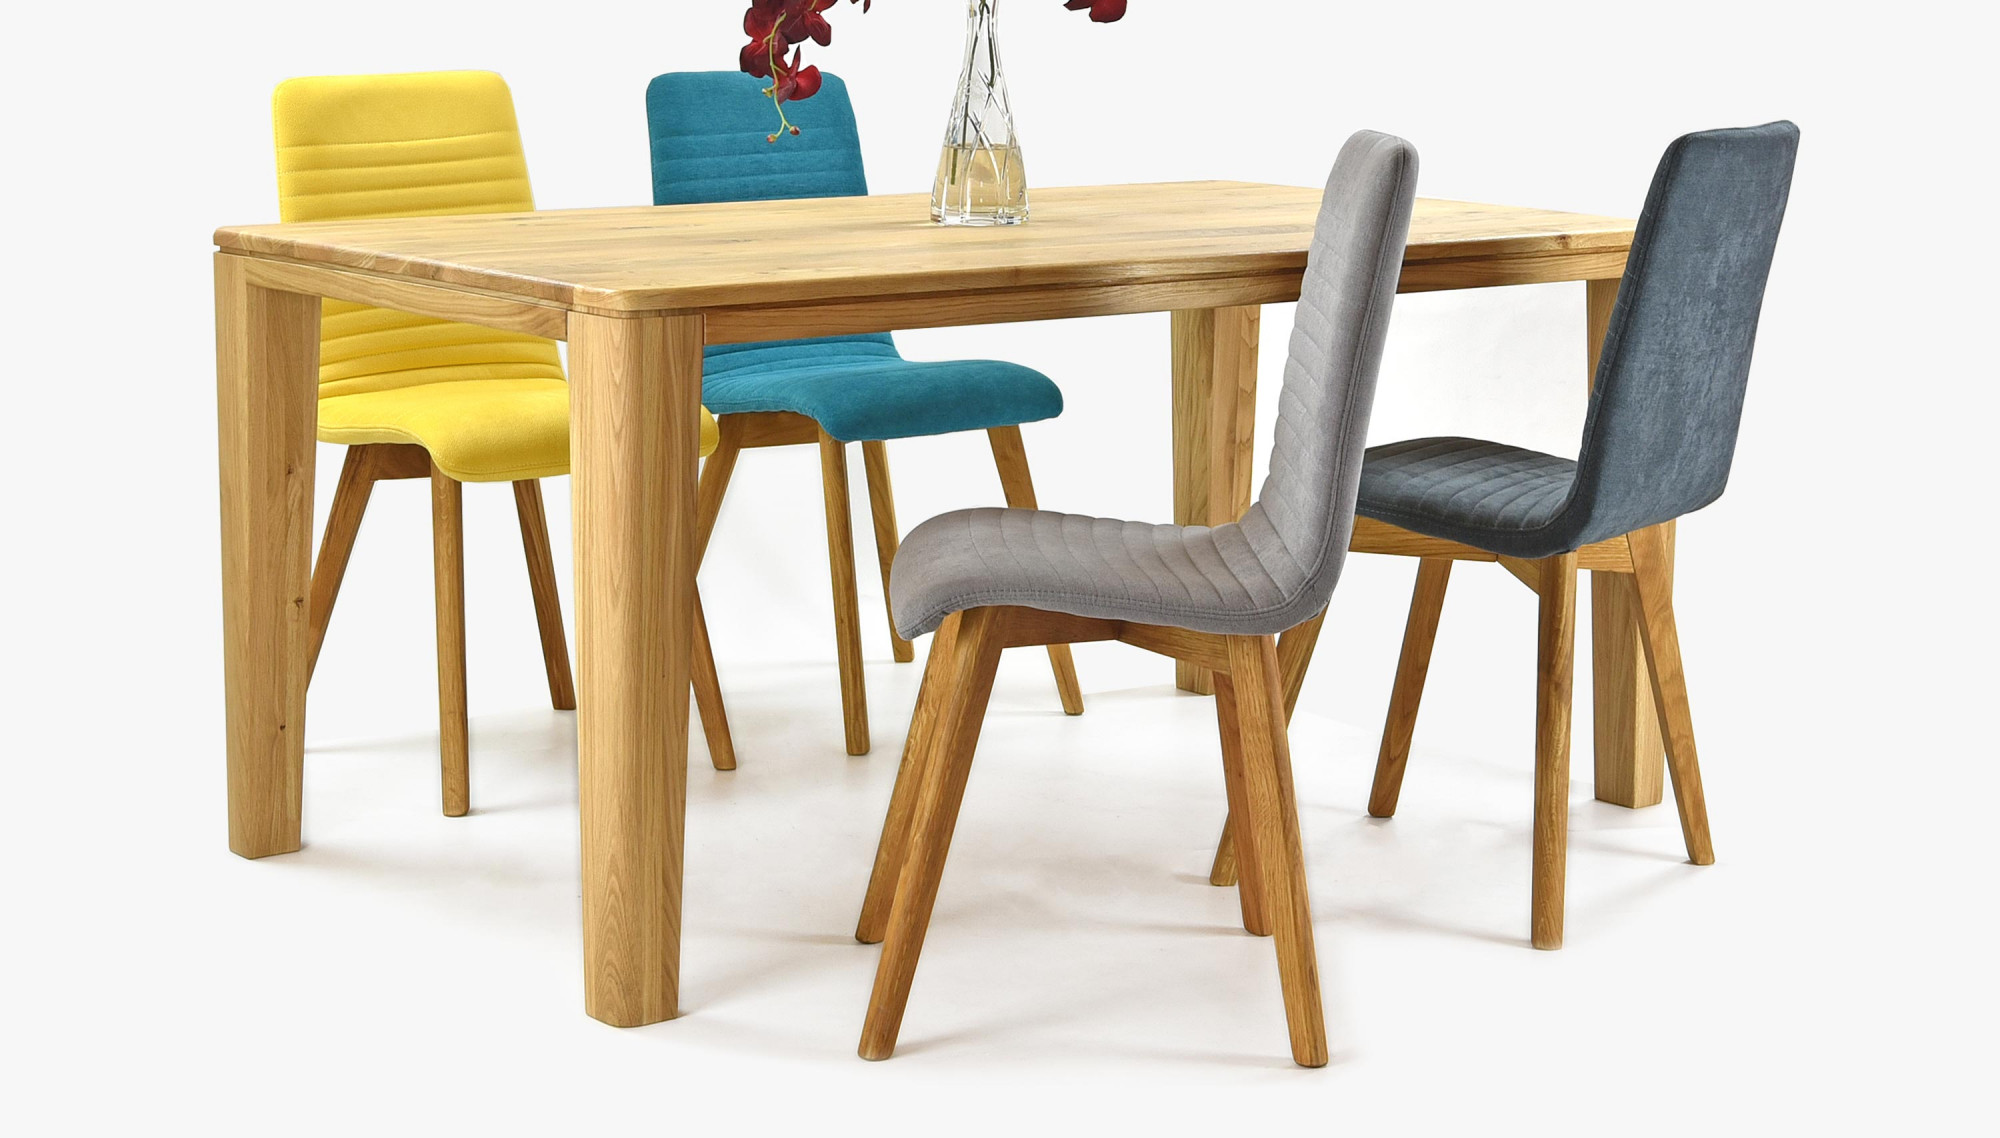 bbb30495d304 Moderný stôl a stoličky do jedálne z masívu